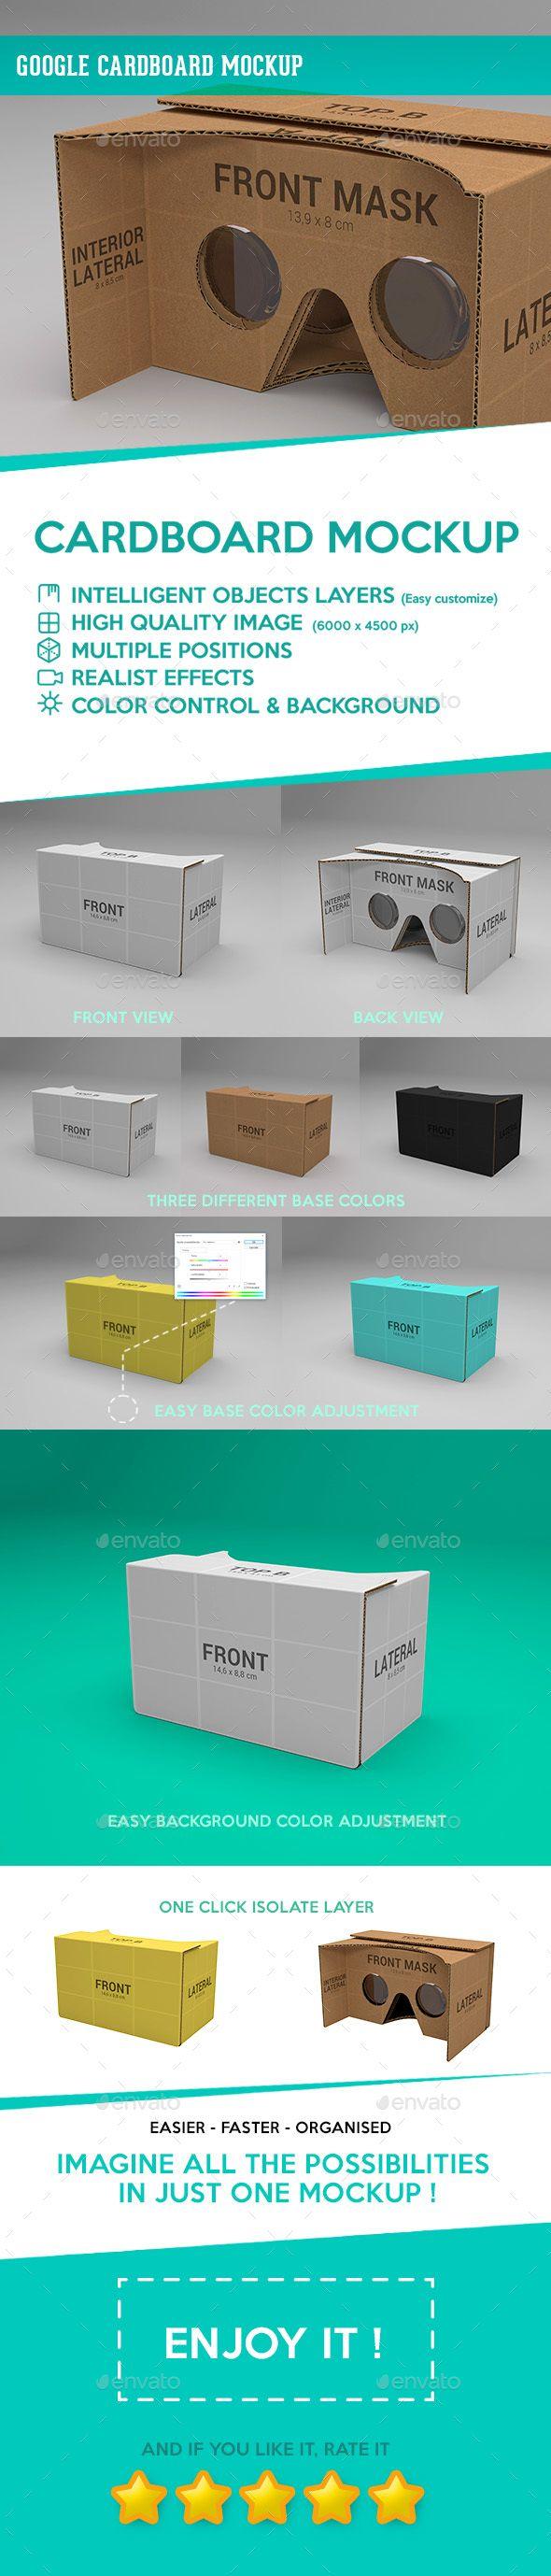 #Google Cardboard #Mockup - Miscellaneous Print Download here: https://graphicriver.net/item/google-cardboard-mockup/19604485?ref=alena994